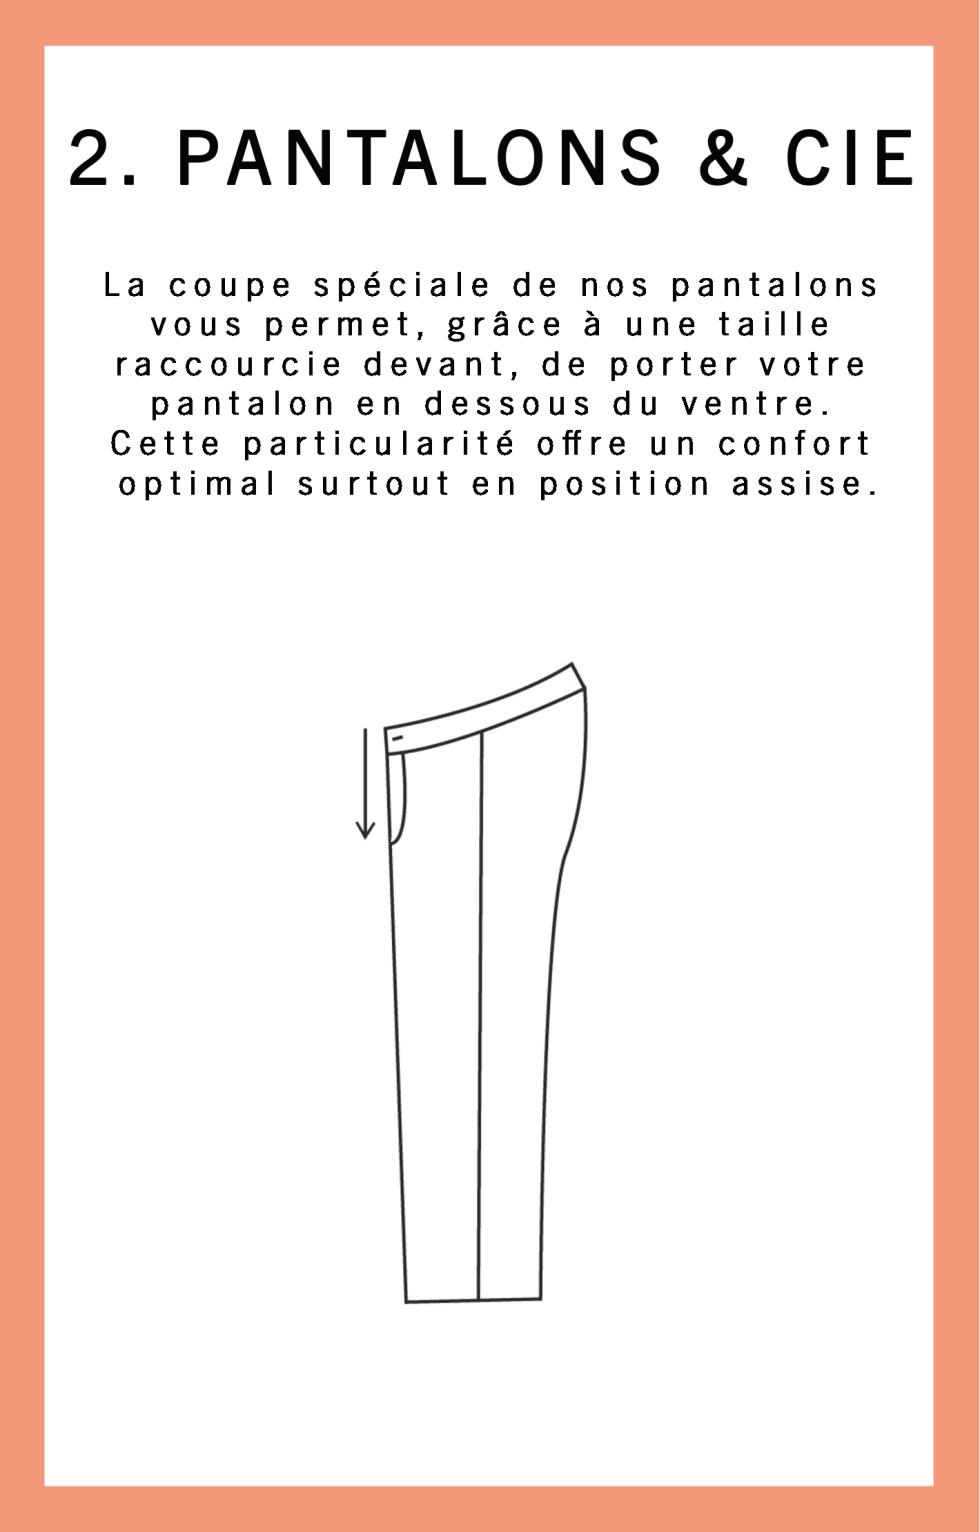 Pantalons & cie